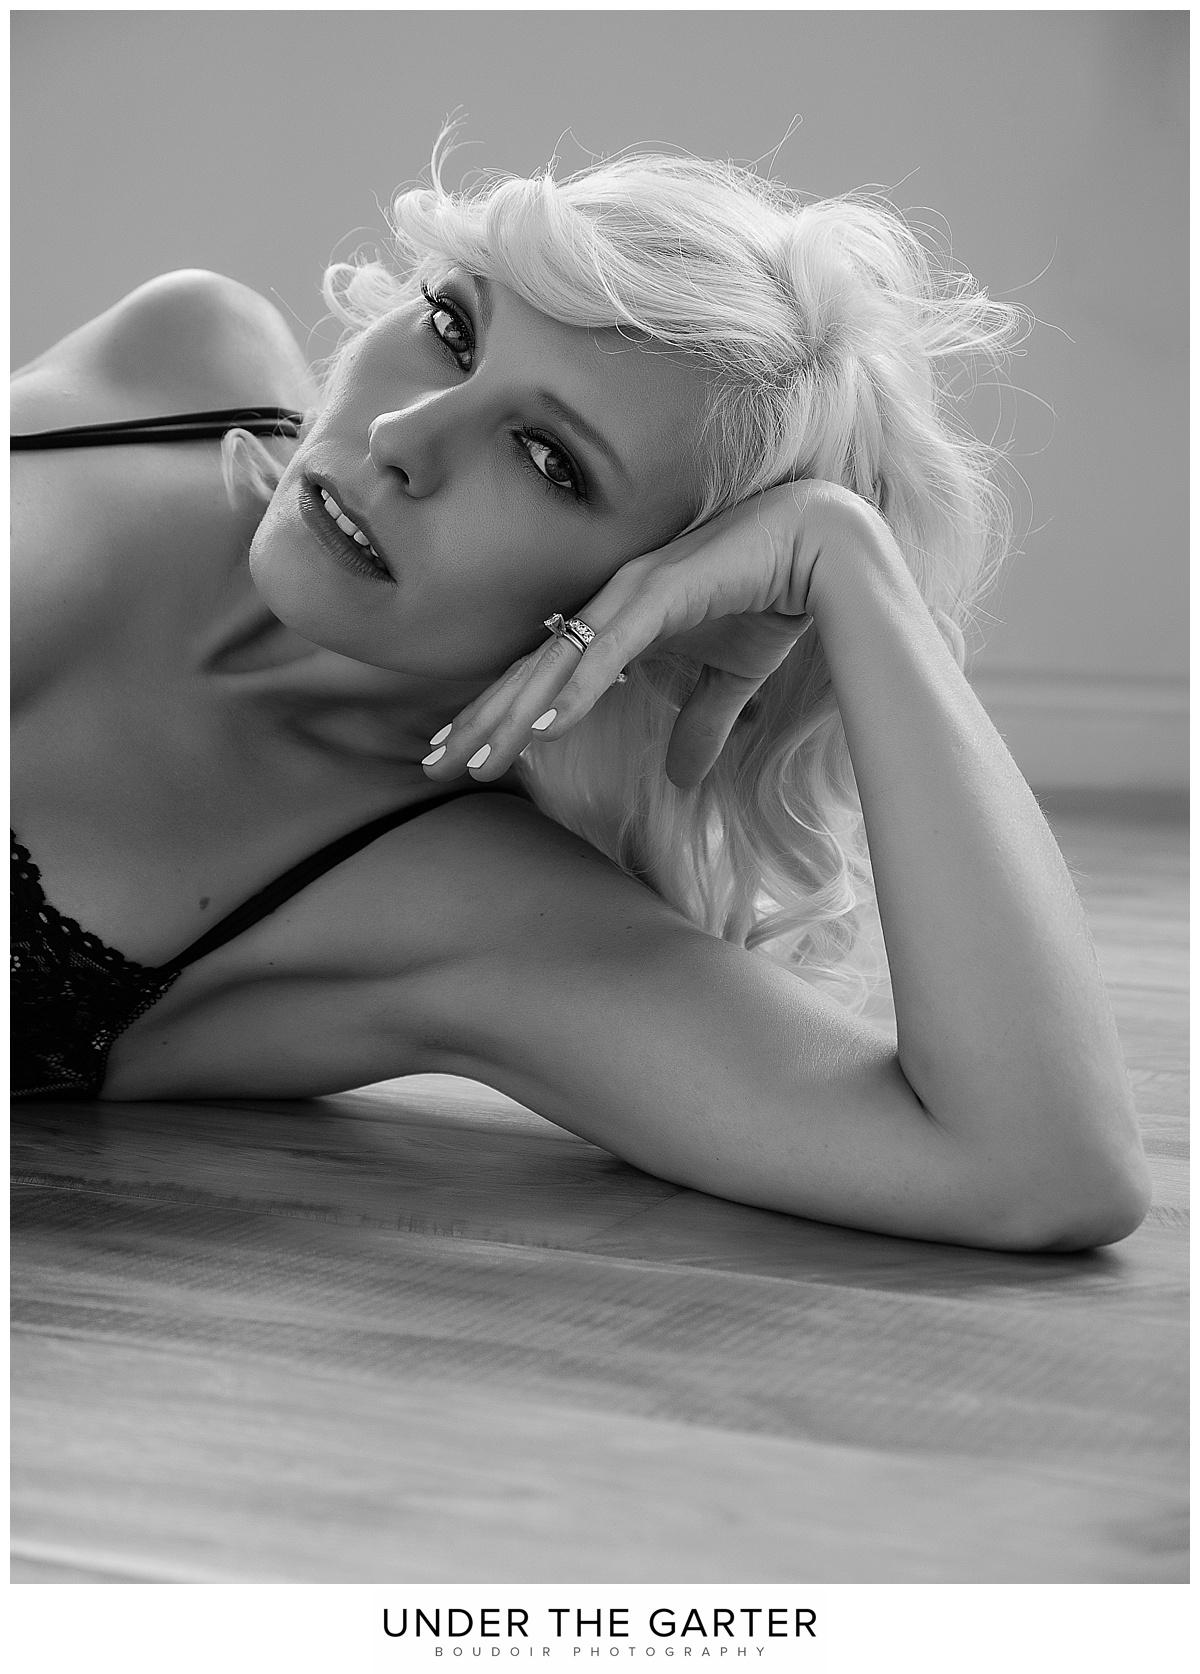 boudoir photography floor pose detail portrait.jpg